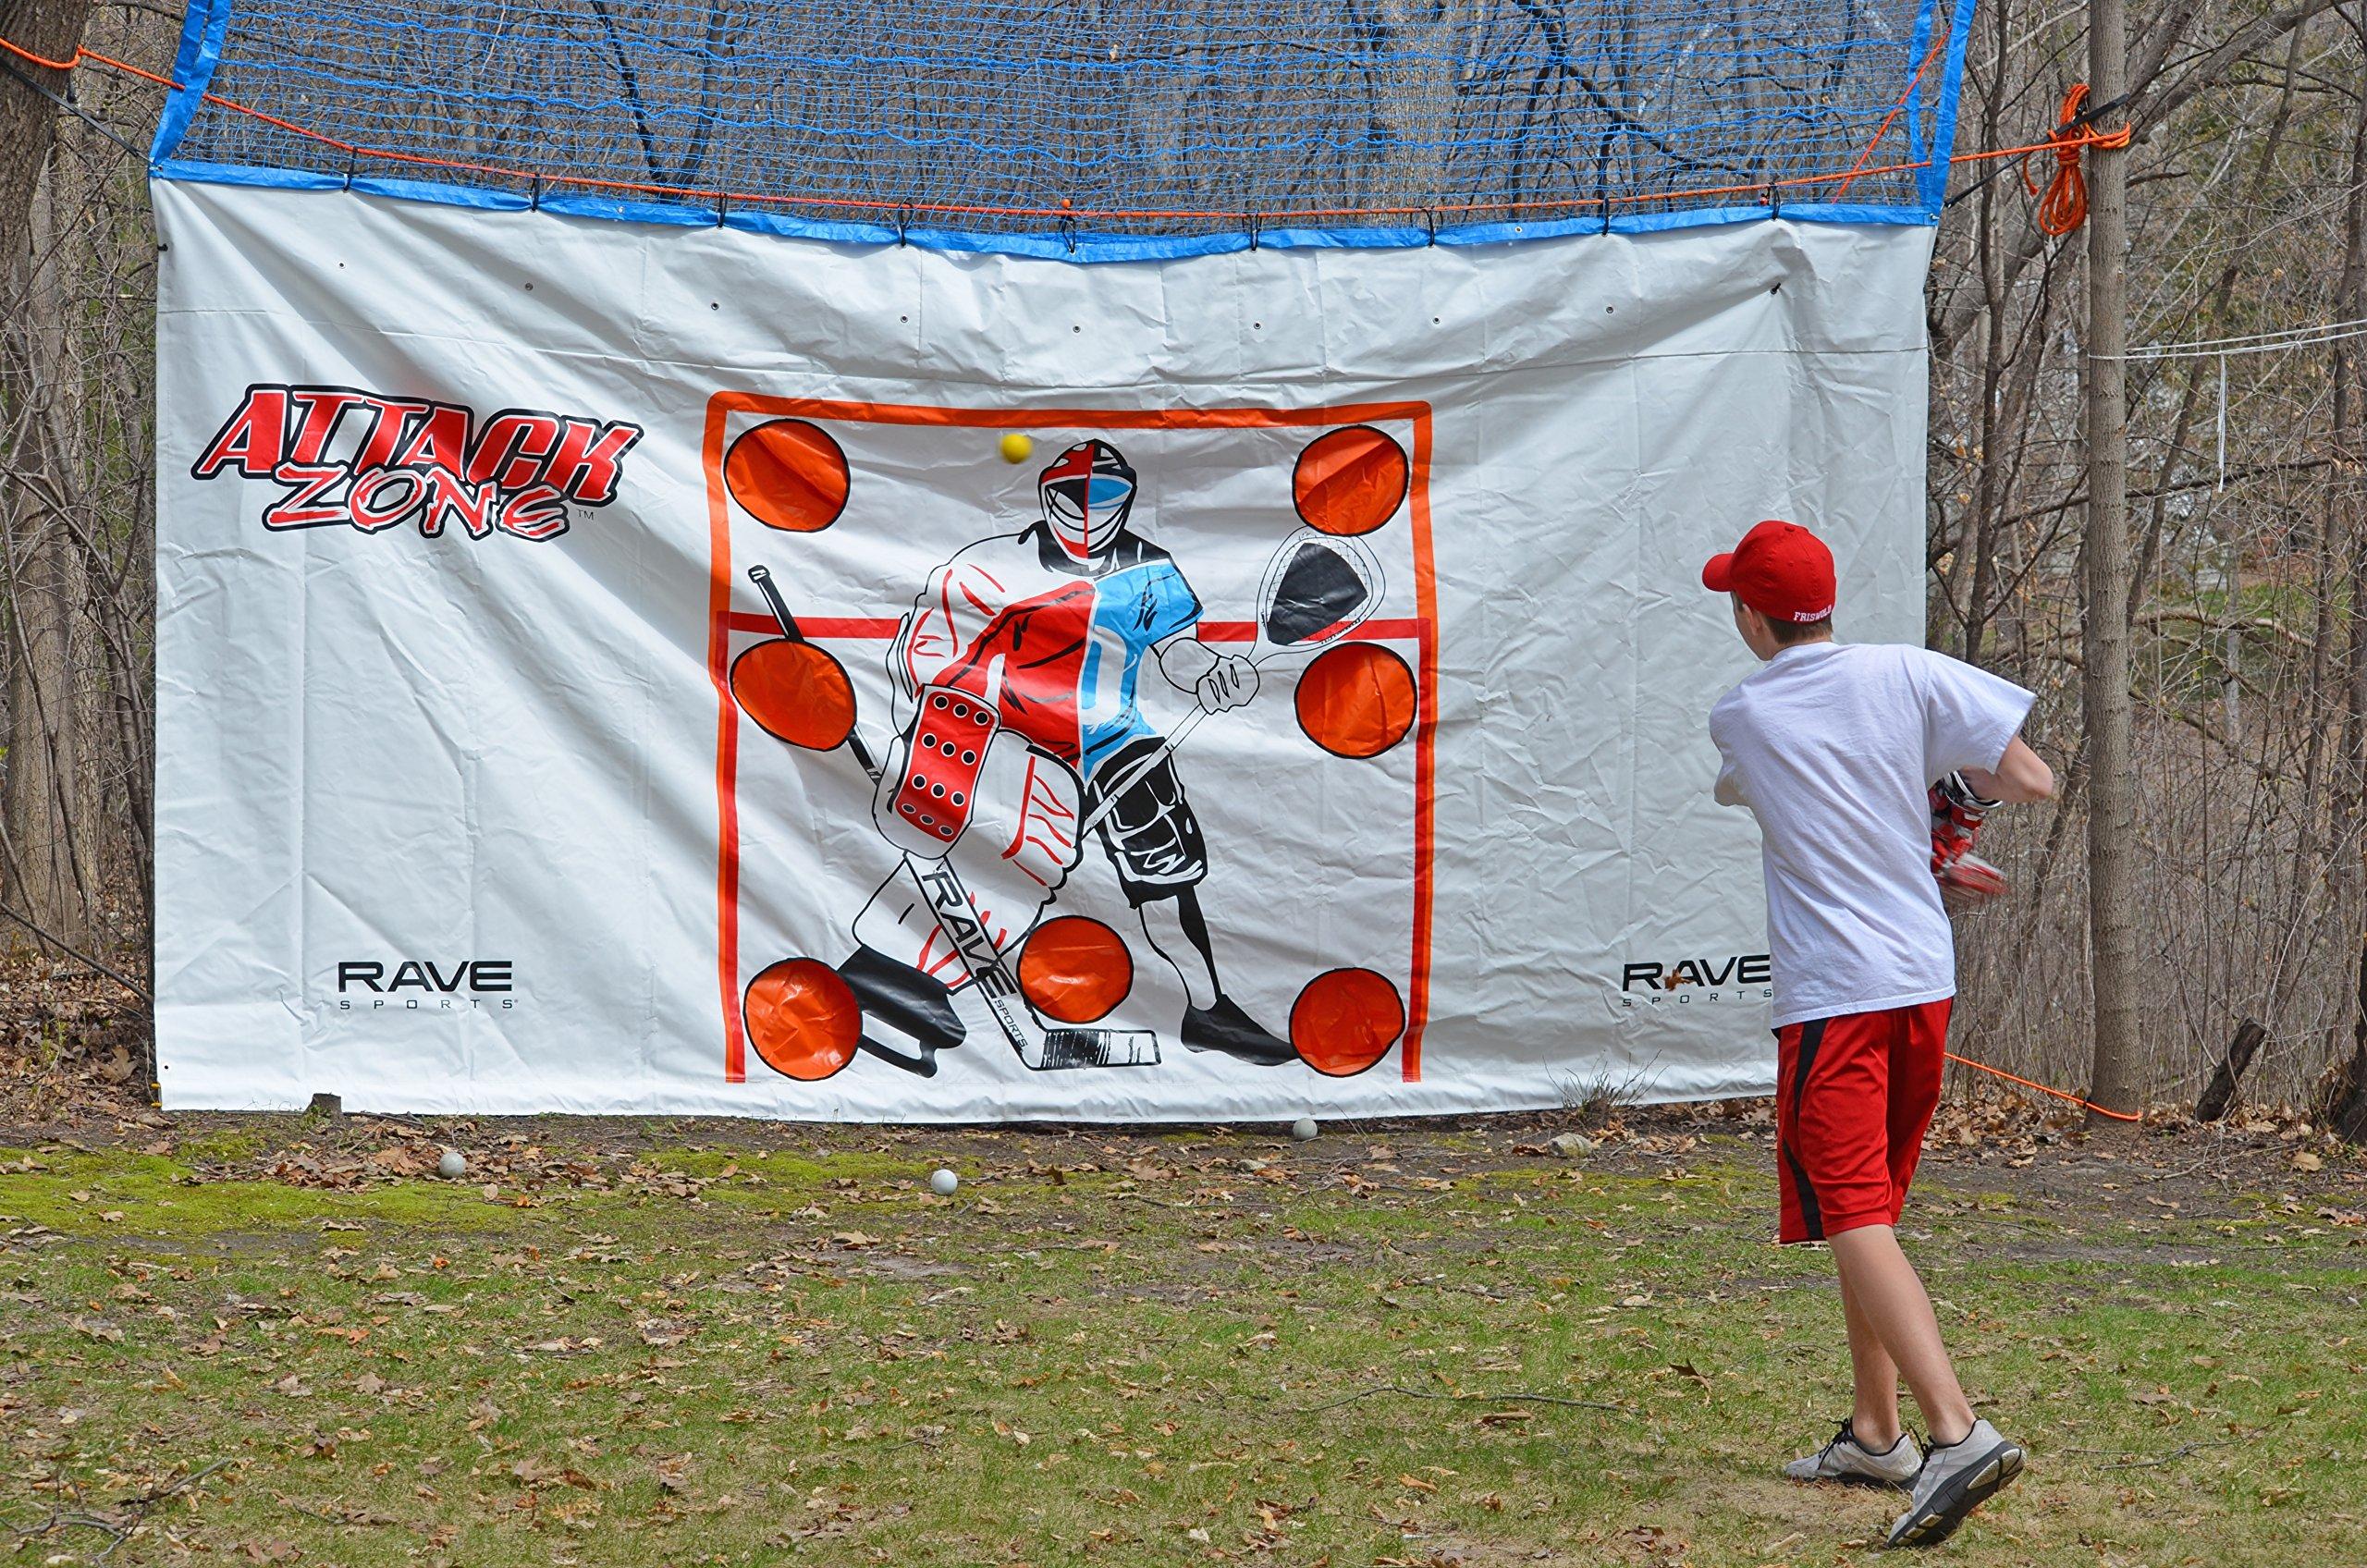 RAVE Sports Attack Zone 16' x 8' Hockey/Lacrosse Tarp by RAVE Sports